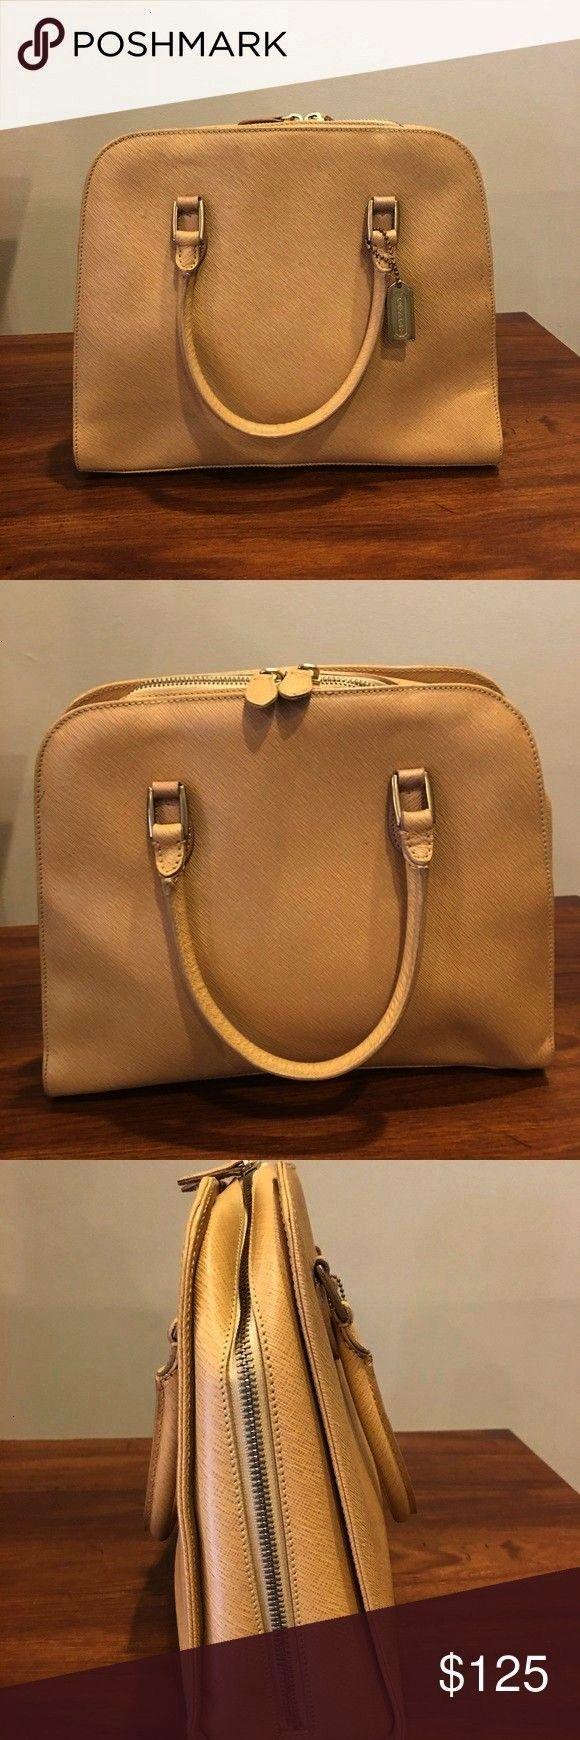 Handbag Classic Make me an offer Elegant Timeless Coach Handbag Very G  Coach Tan Handbag Classic Make me an offer Elegant Timeless Coach Handbag Very G  Coach Tan Handba...